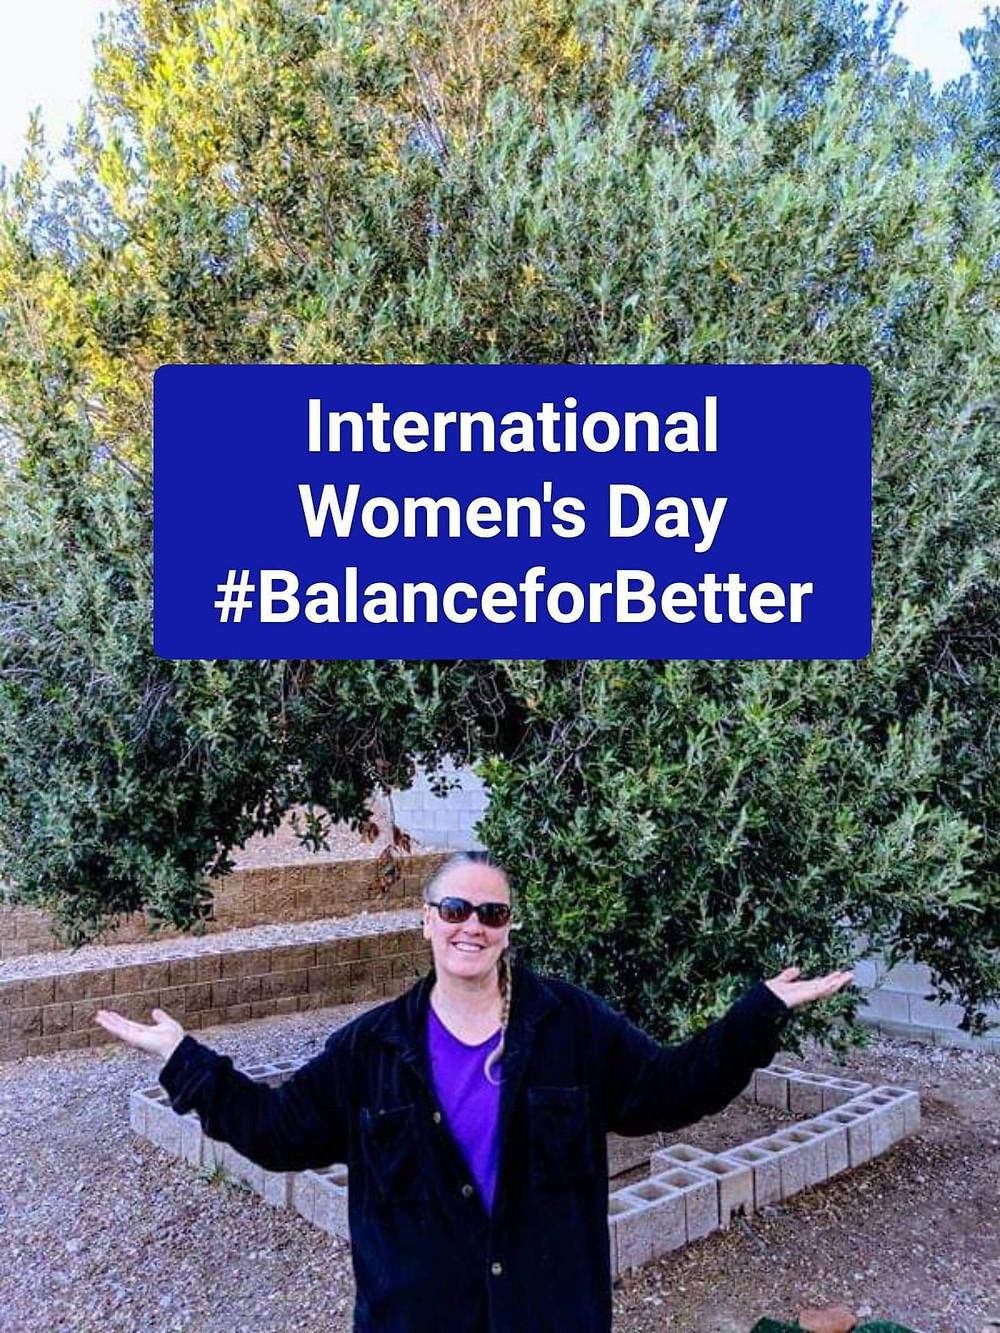 IWD2019 Balance for Better